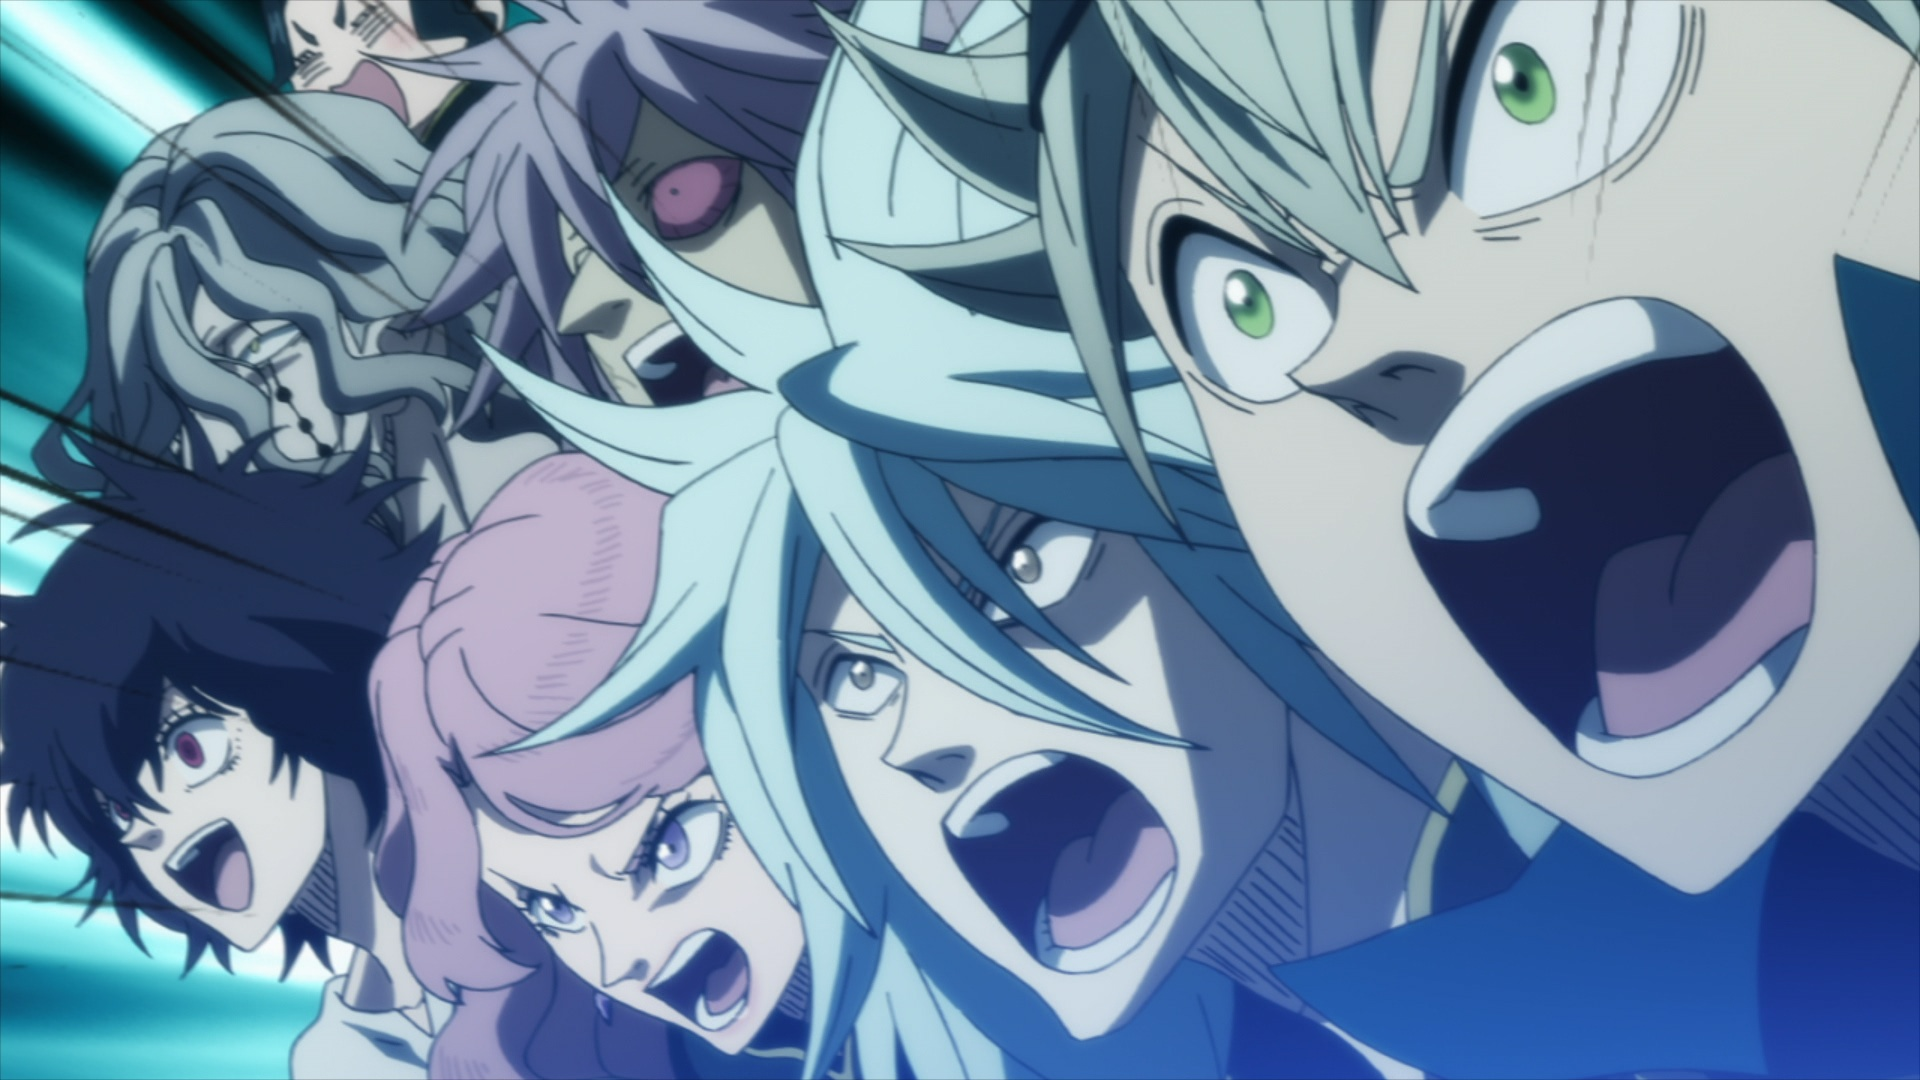 Watch Black Clover Season 3 Episode 110 Sub Dub Anime Simulcast Funimation